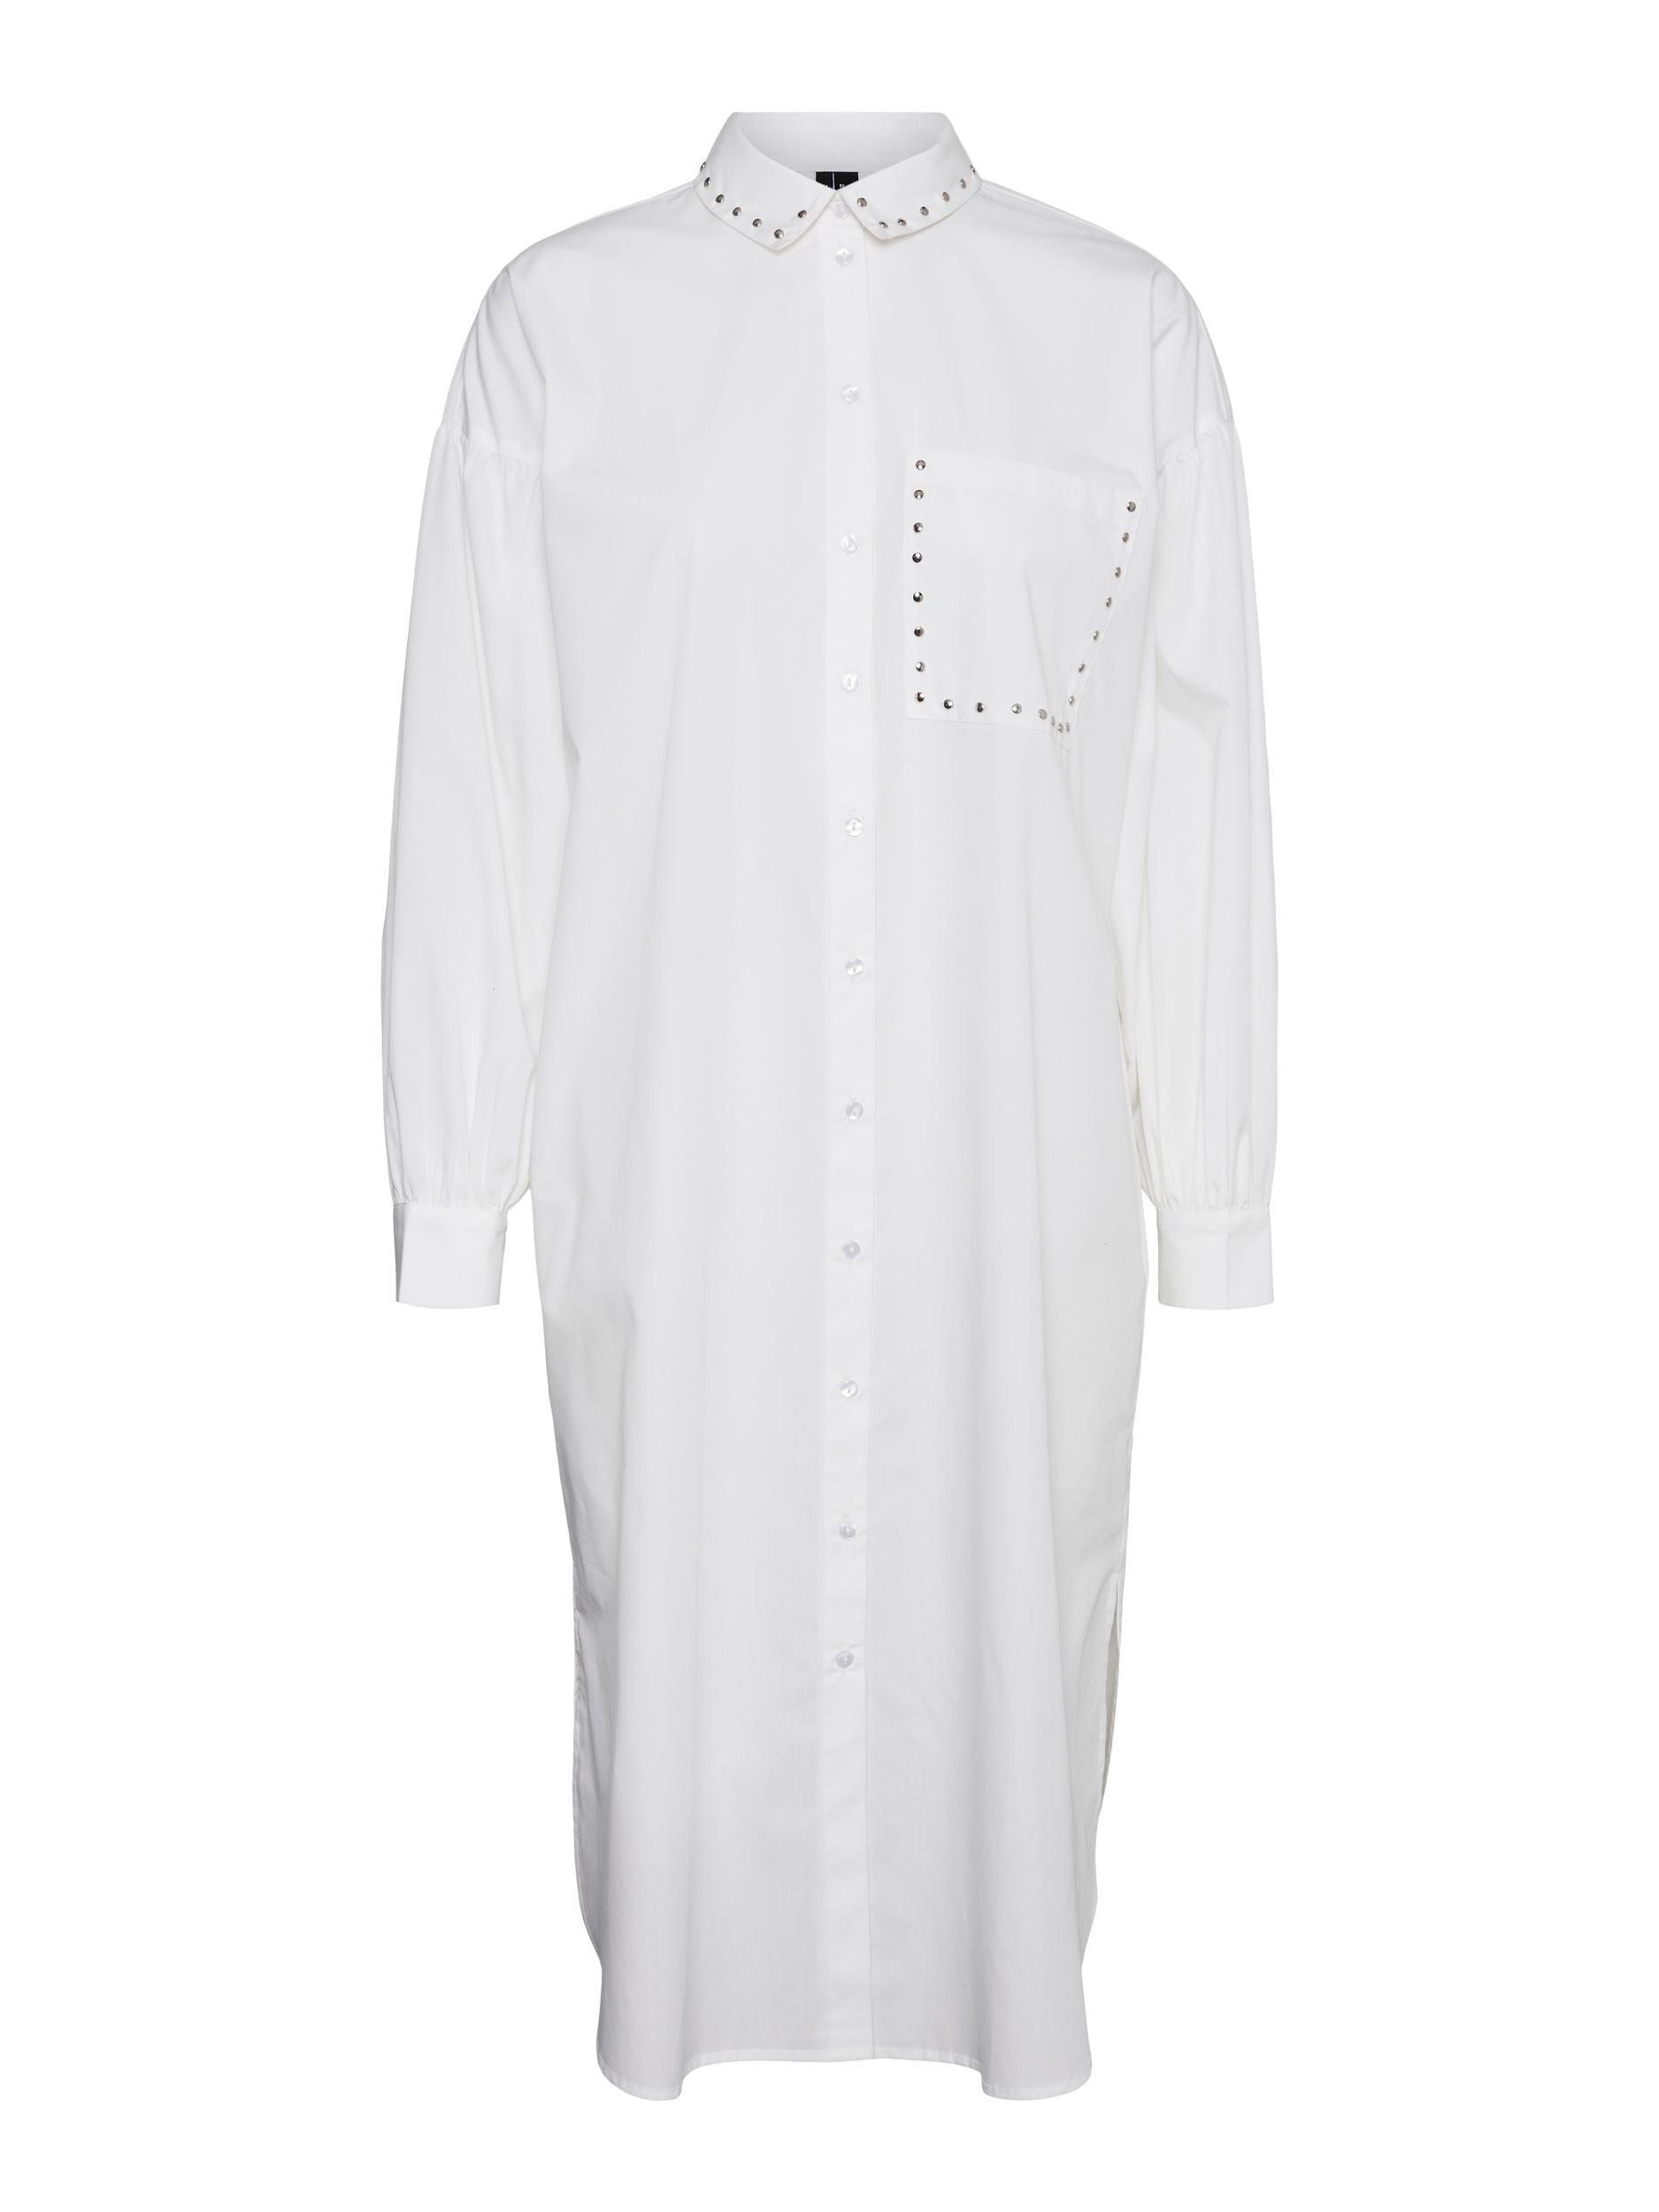 Vero Moda Hillan lang skjorte, snow white, medium